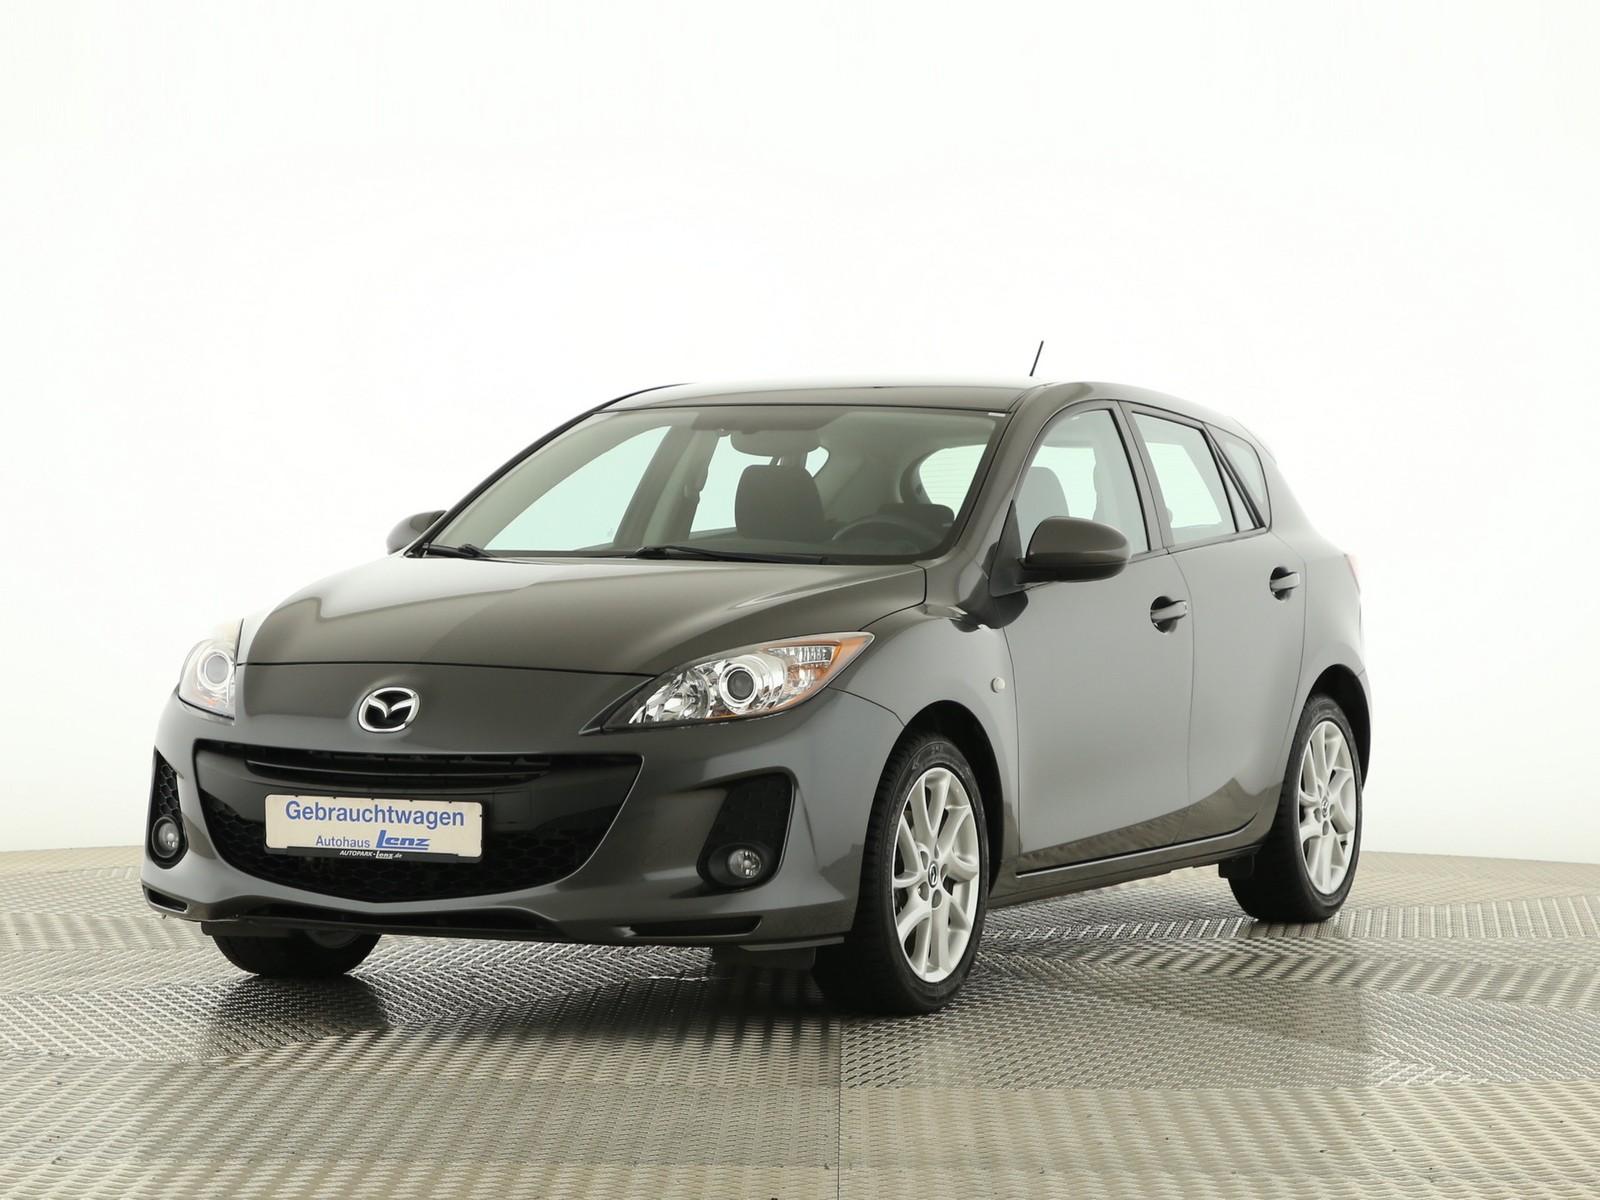 Mazda 3 Edition AHK PDC SHZ RVM Tempomat Klima Nebel, Jahr 2013, Benzin